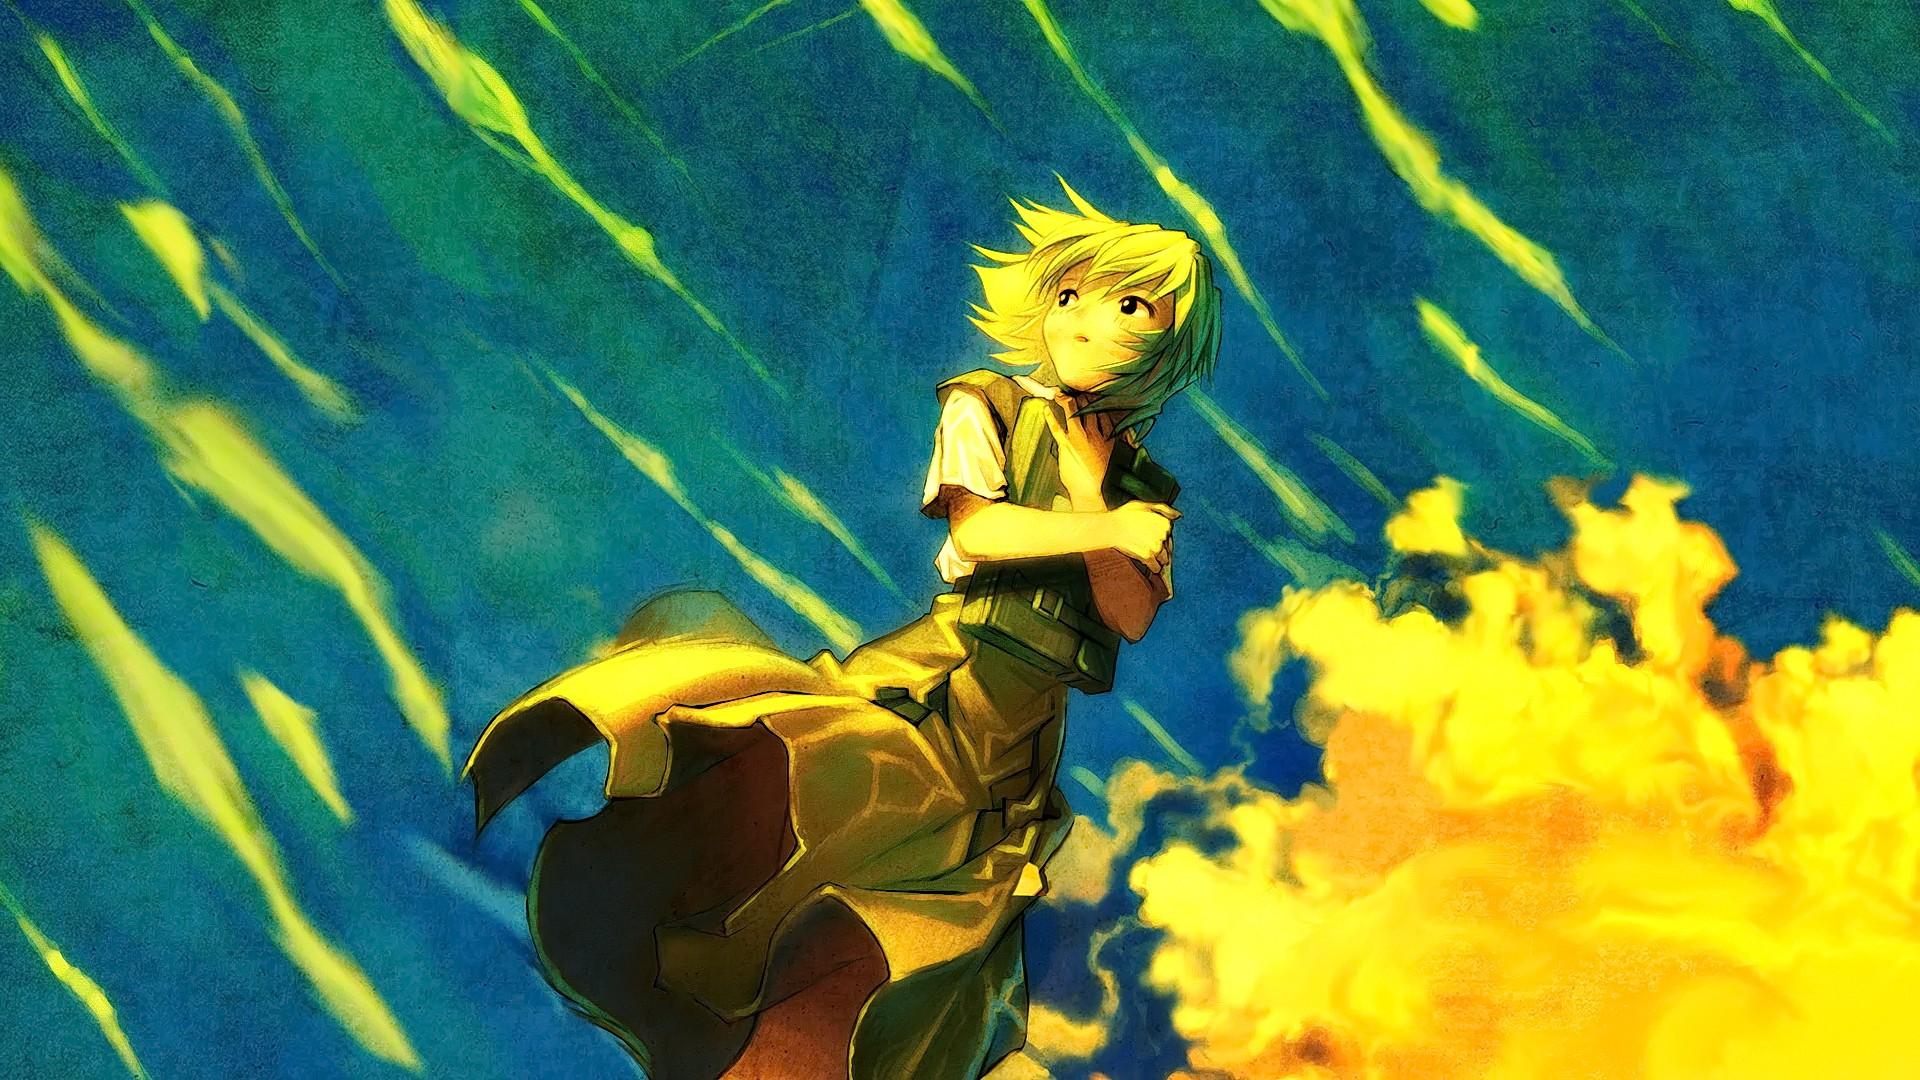 Neon Yellow Anime Wallpaper - Anime Wallpaper HD